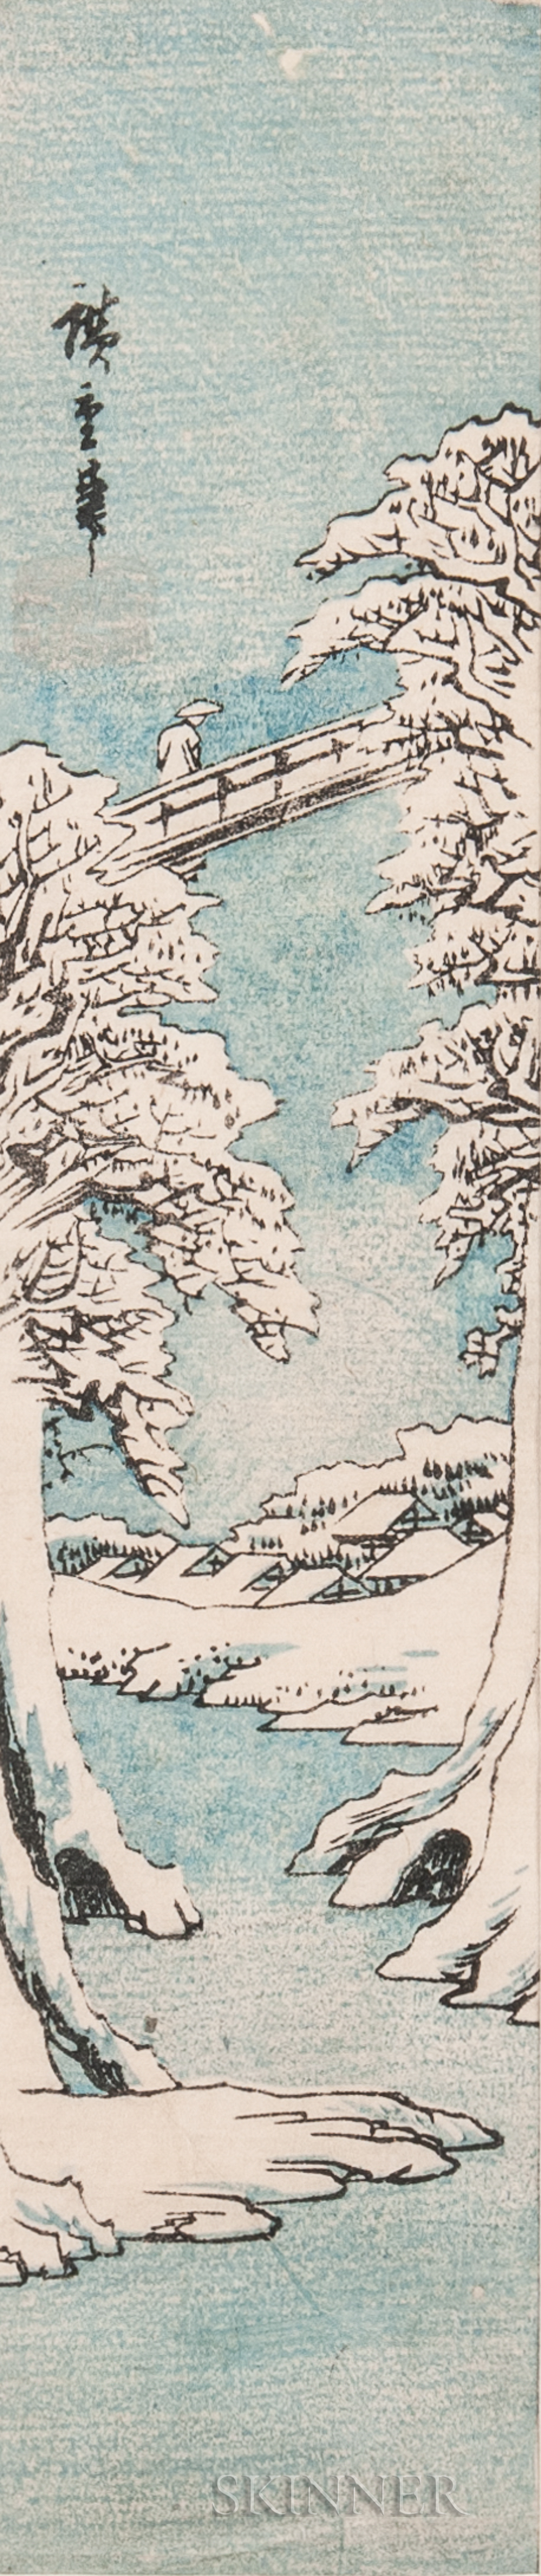 Utagawa Hiroshige (1797-1858), The Monkey Bridge in Winter